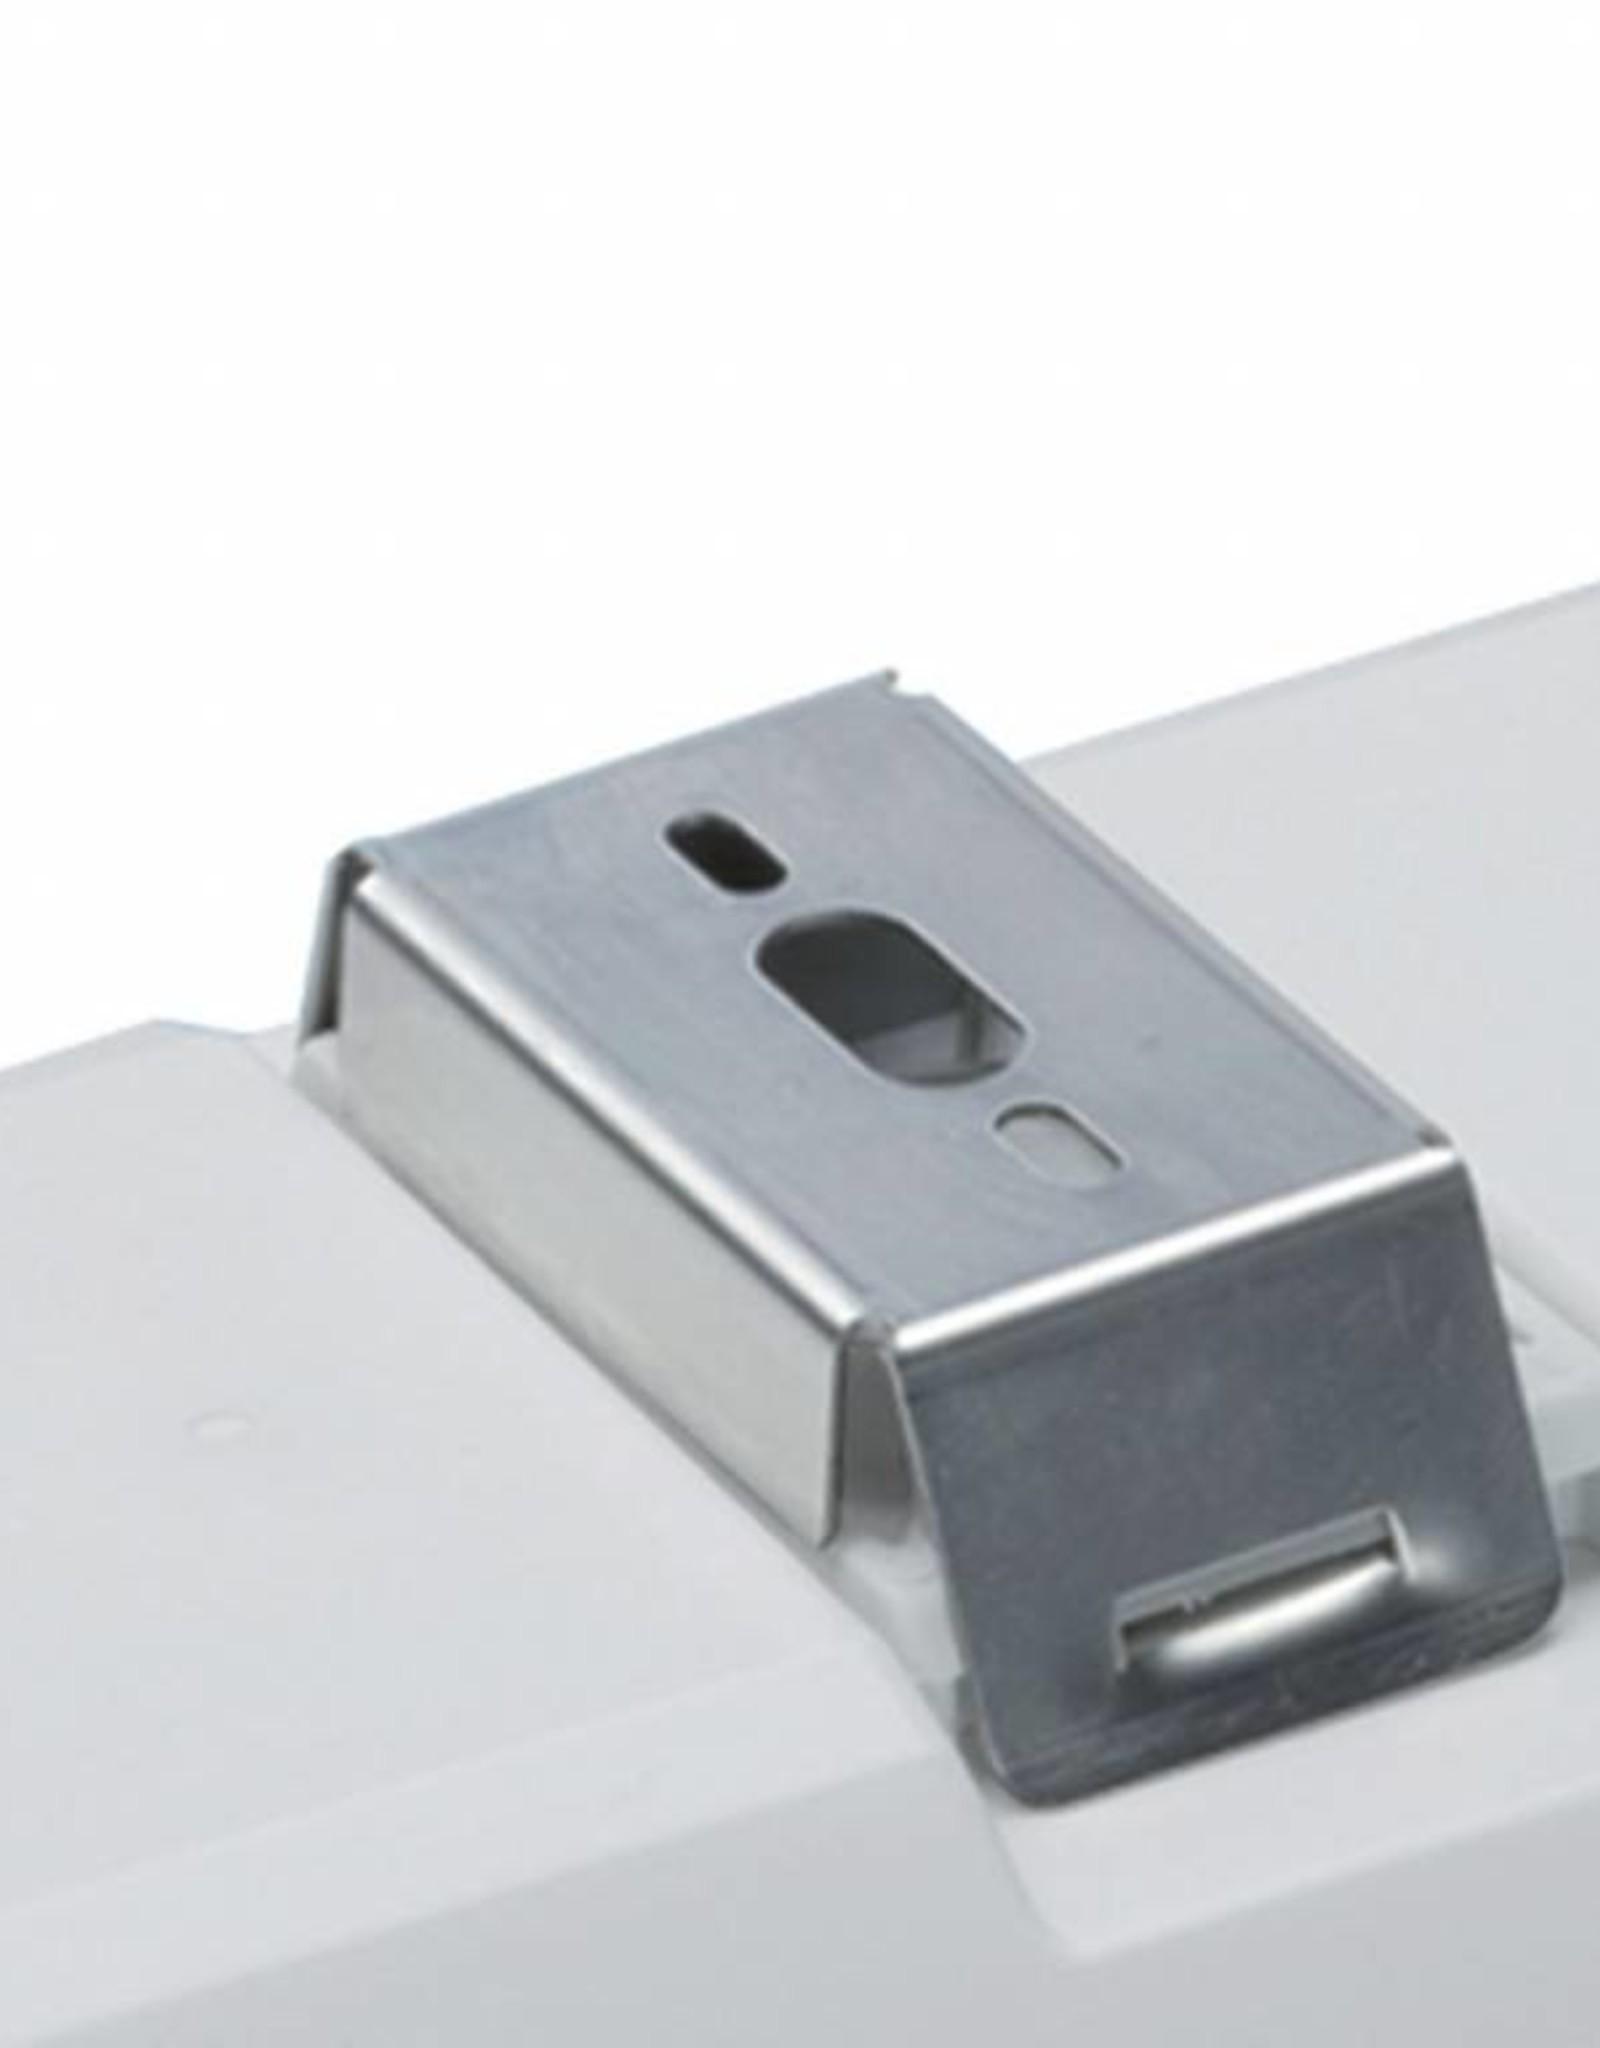 PRIMA FUTURA 2.4ft ABSc Al 5200/840 met DALI dimmer